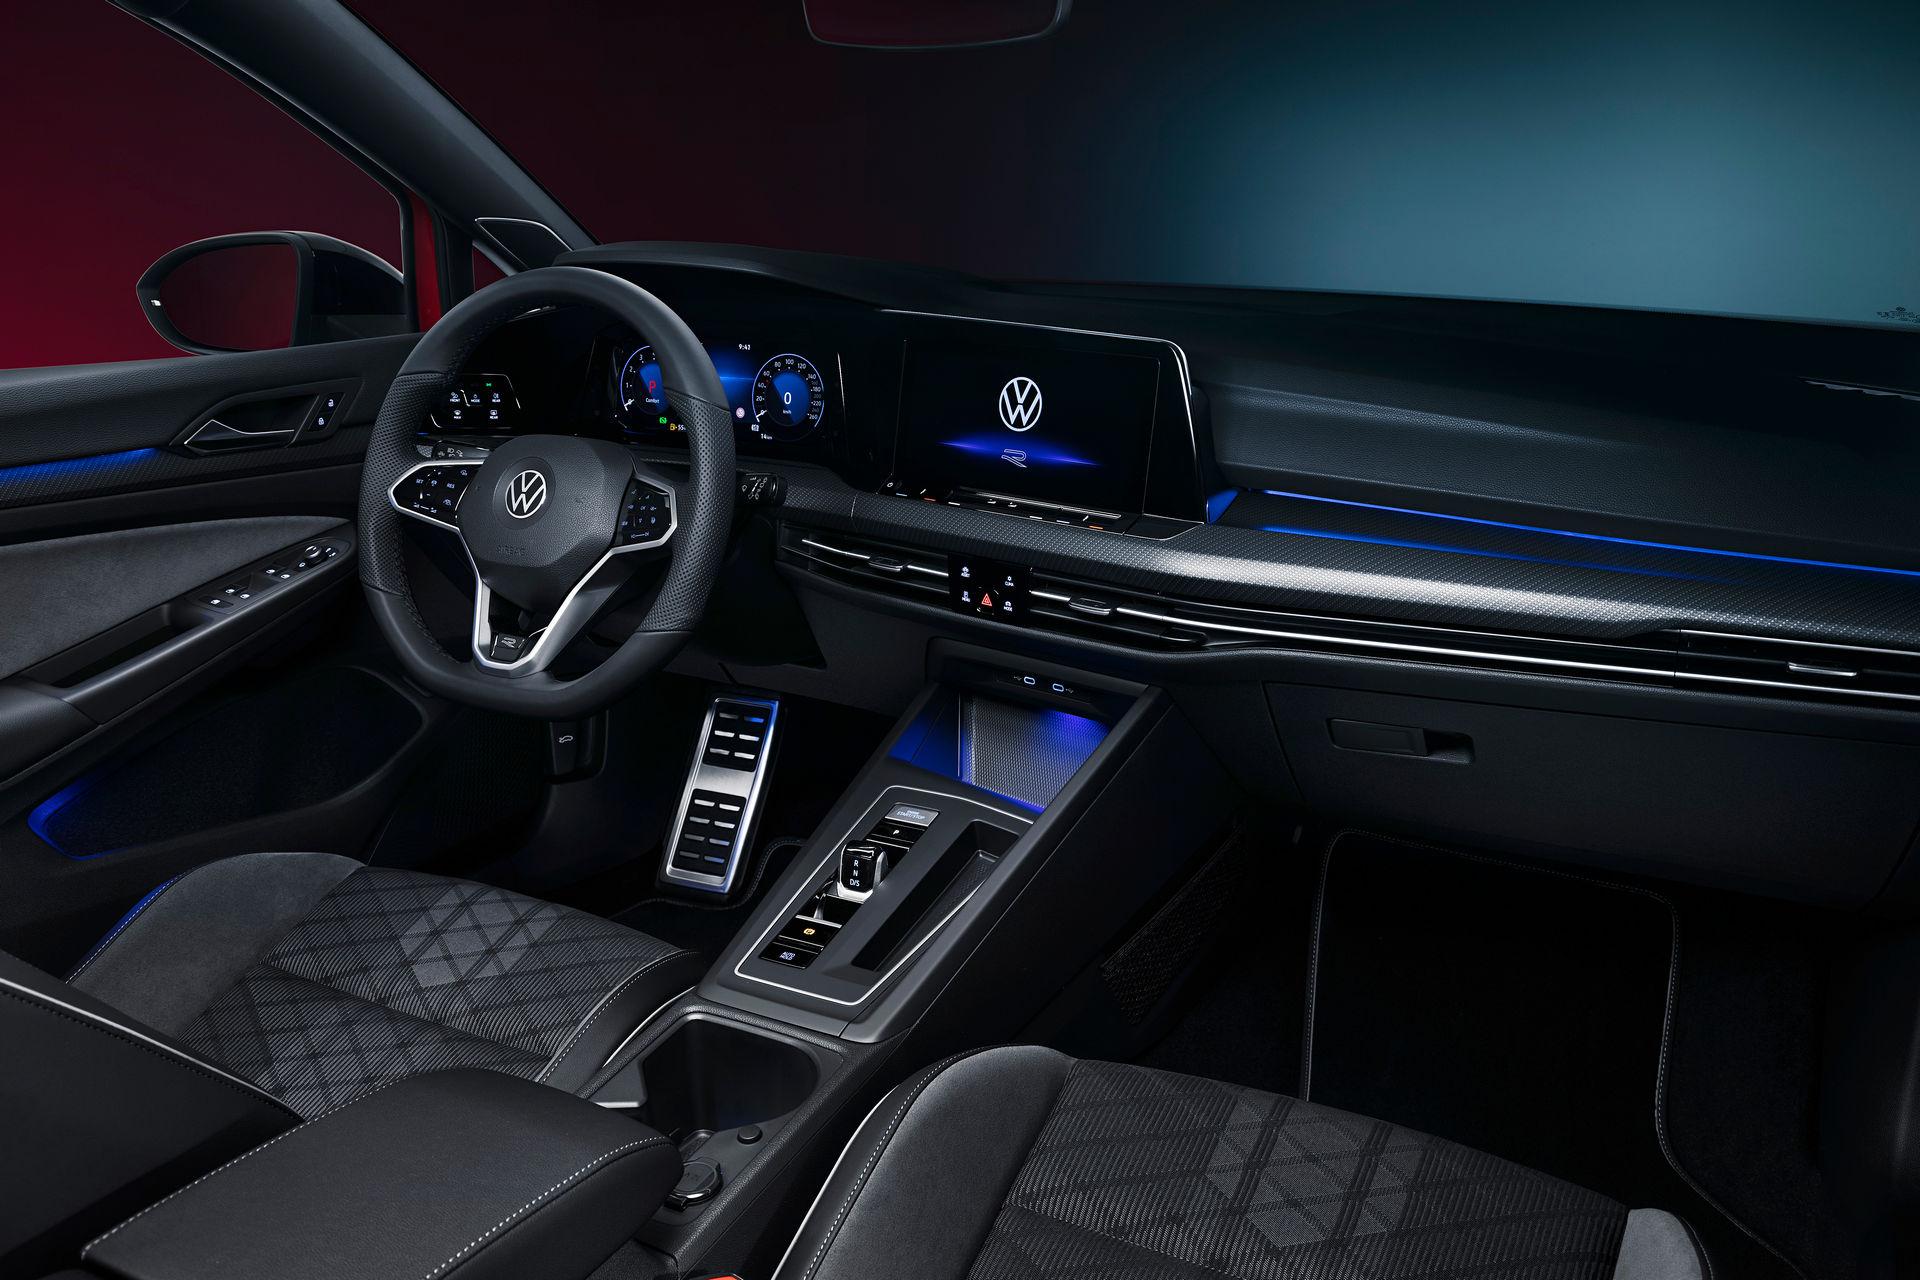 VW GOLF VARIANT 5